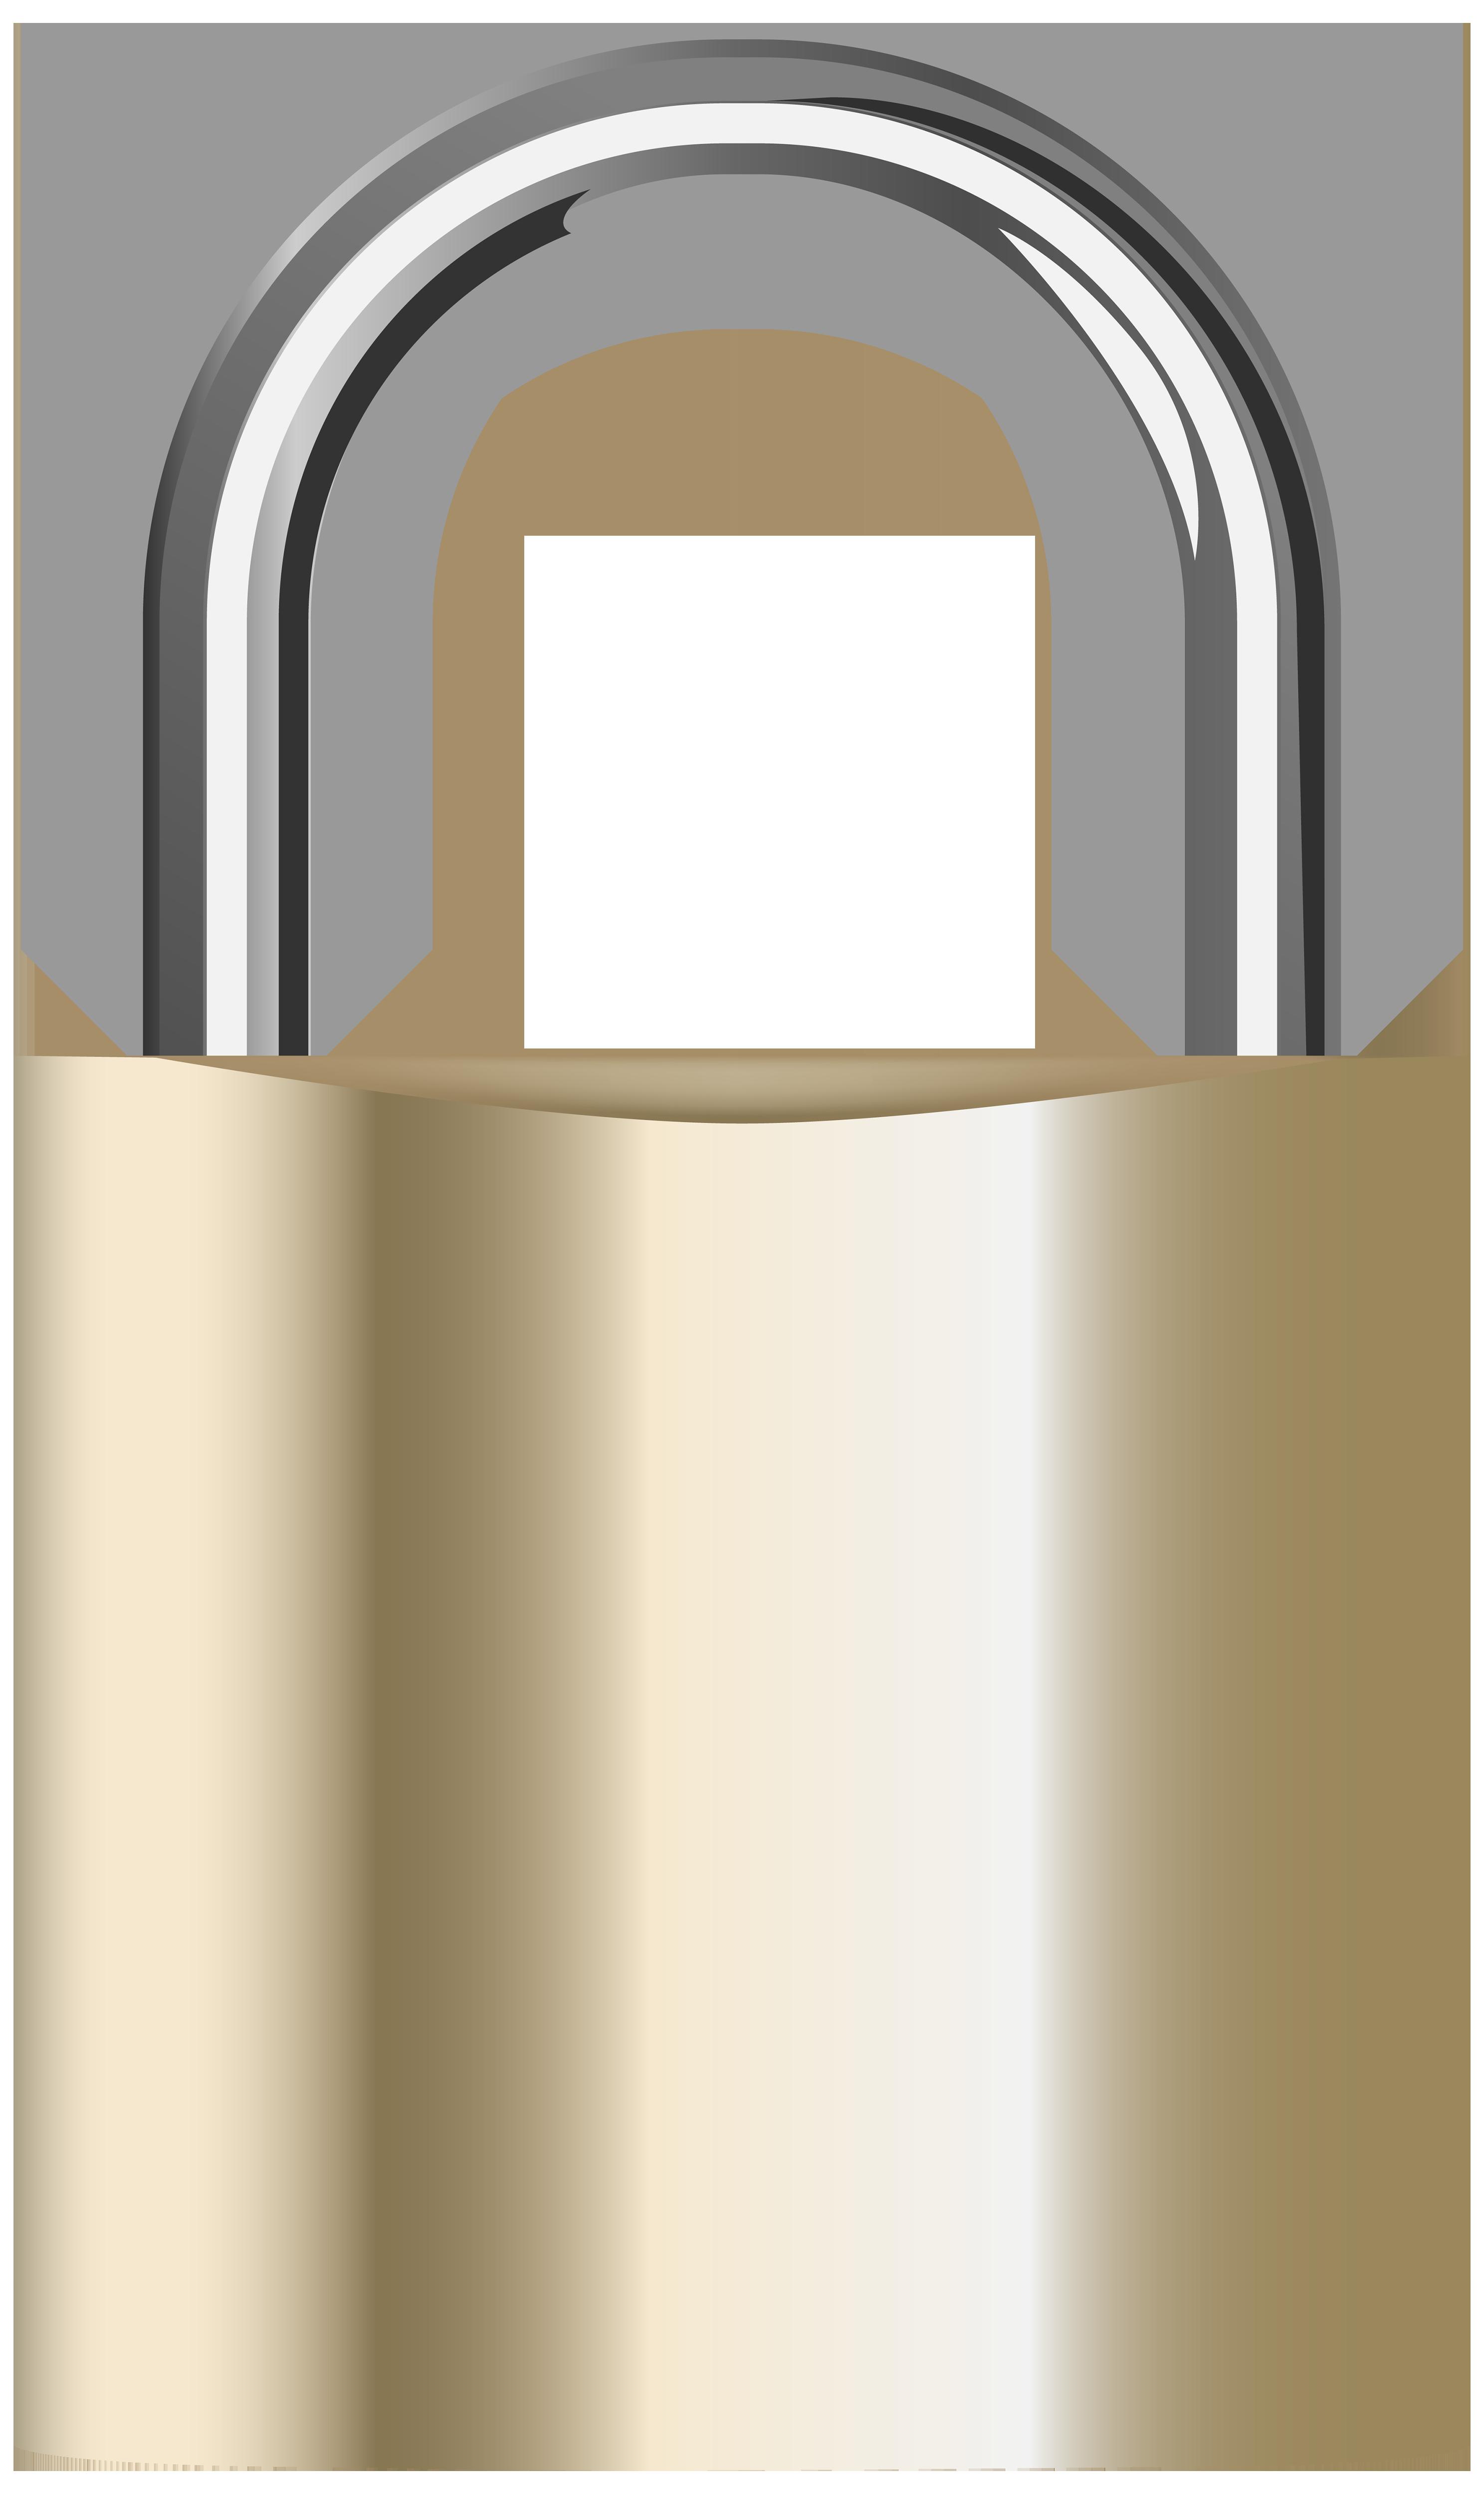 Money clipart lock. Png clip art best